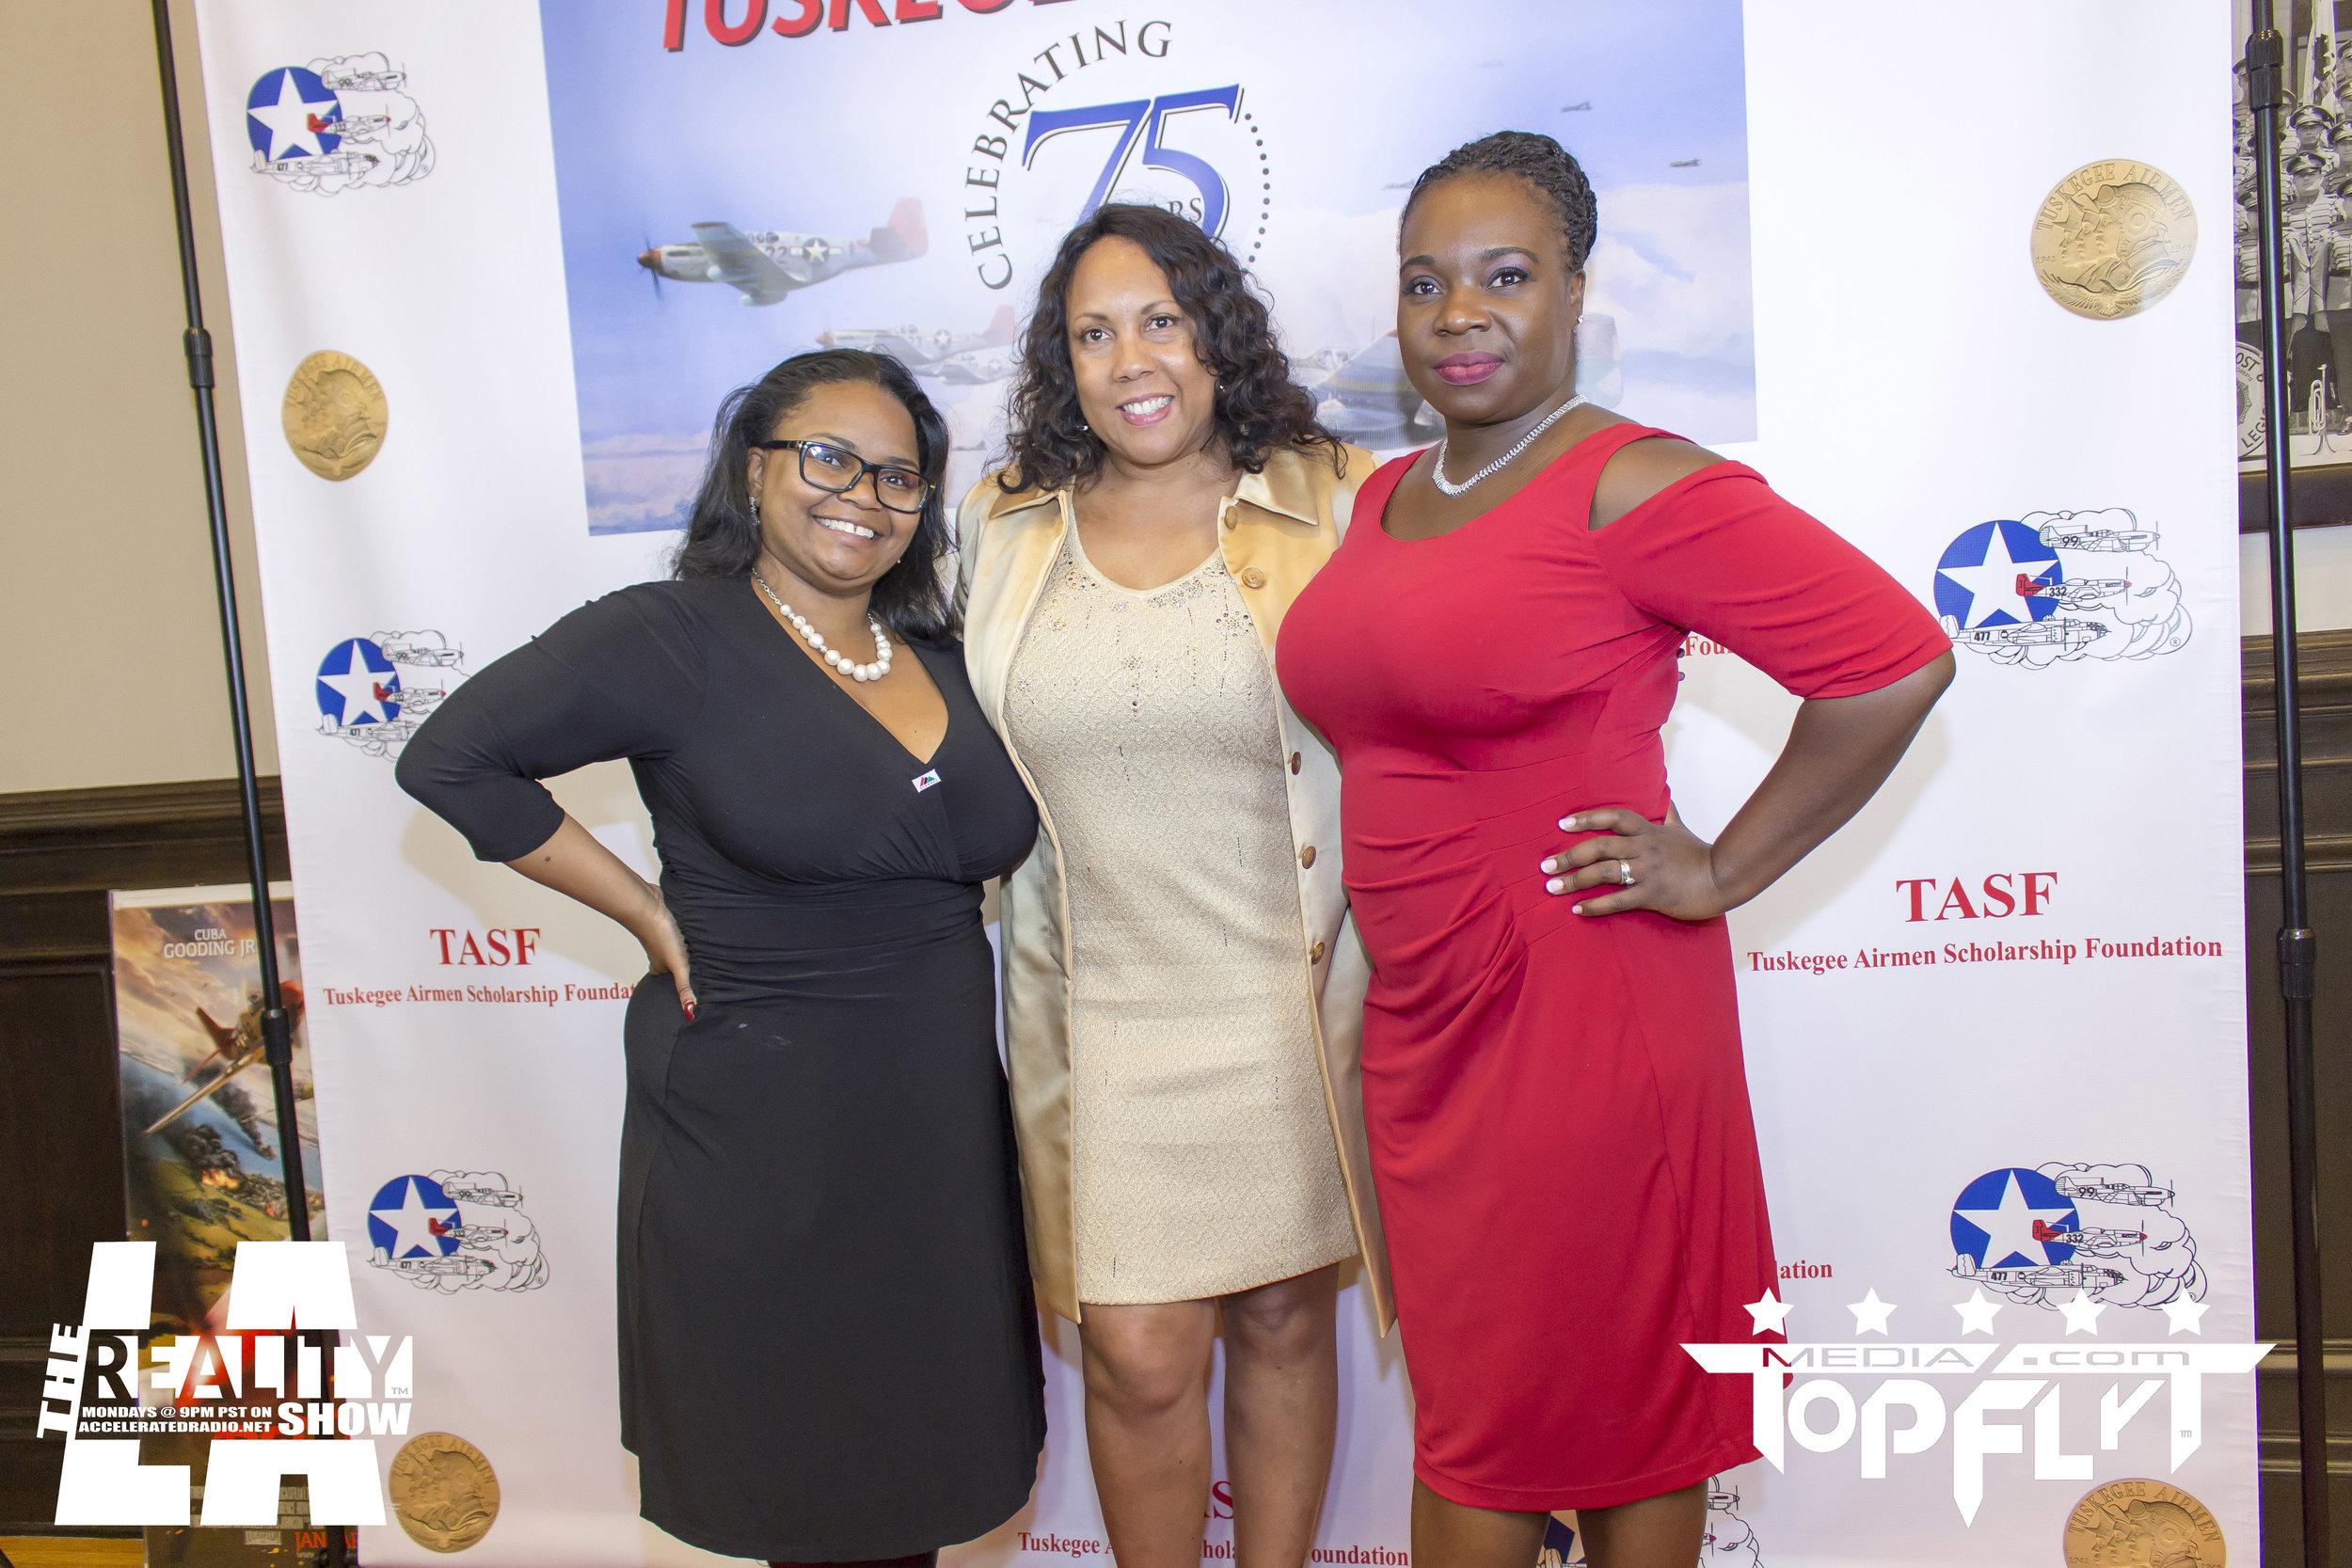 The Reality Show LA - Tuskegee Airmen 75th Anniversary VIP Reception_93.jpg